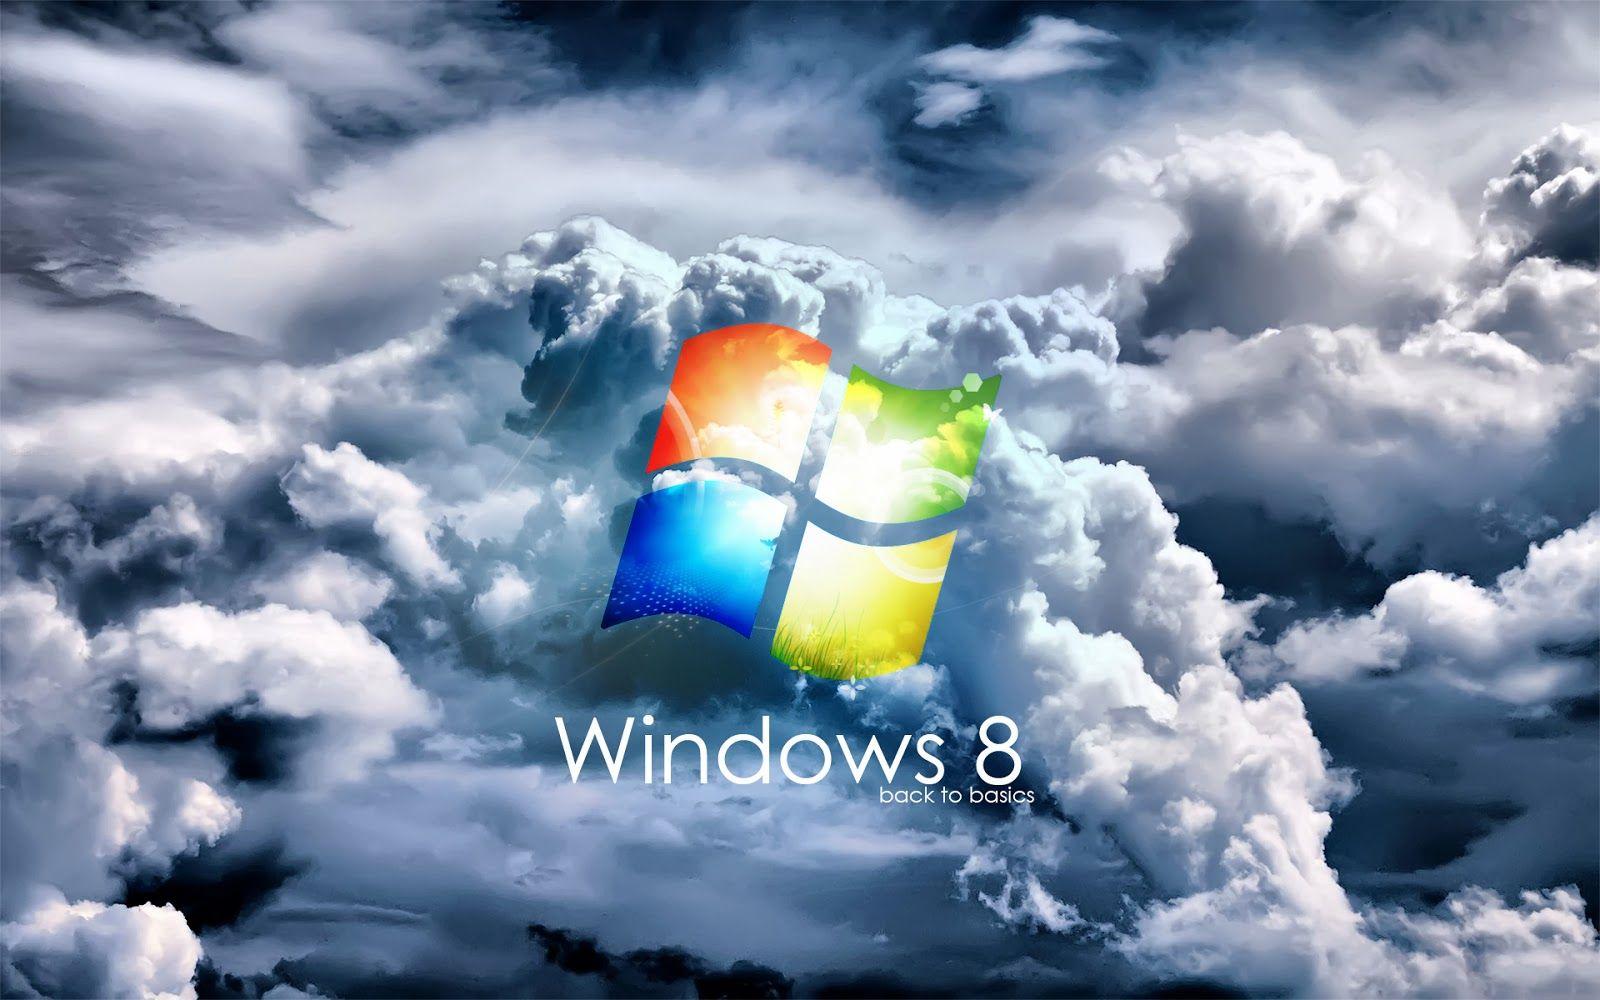 Amazing Windows 8 Pictures Cloud wallpaper, Clouds